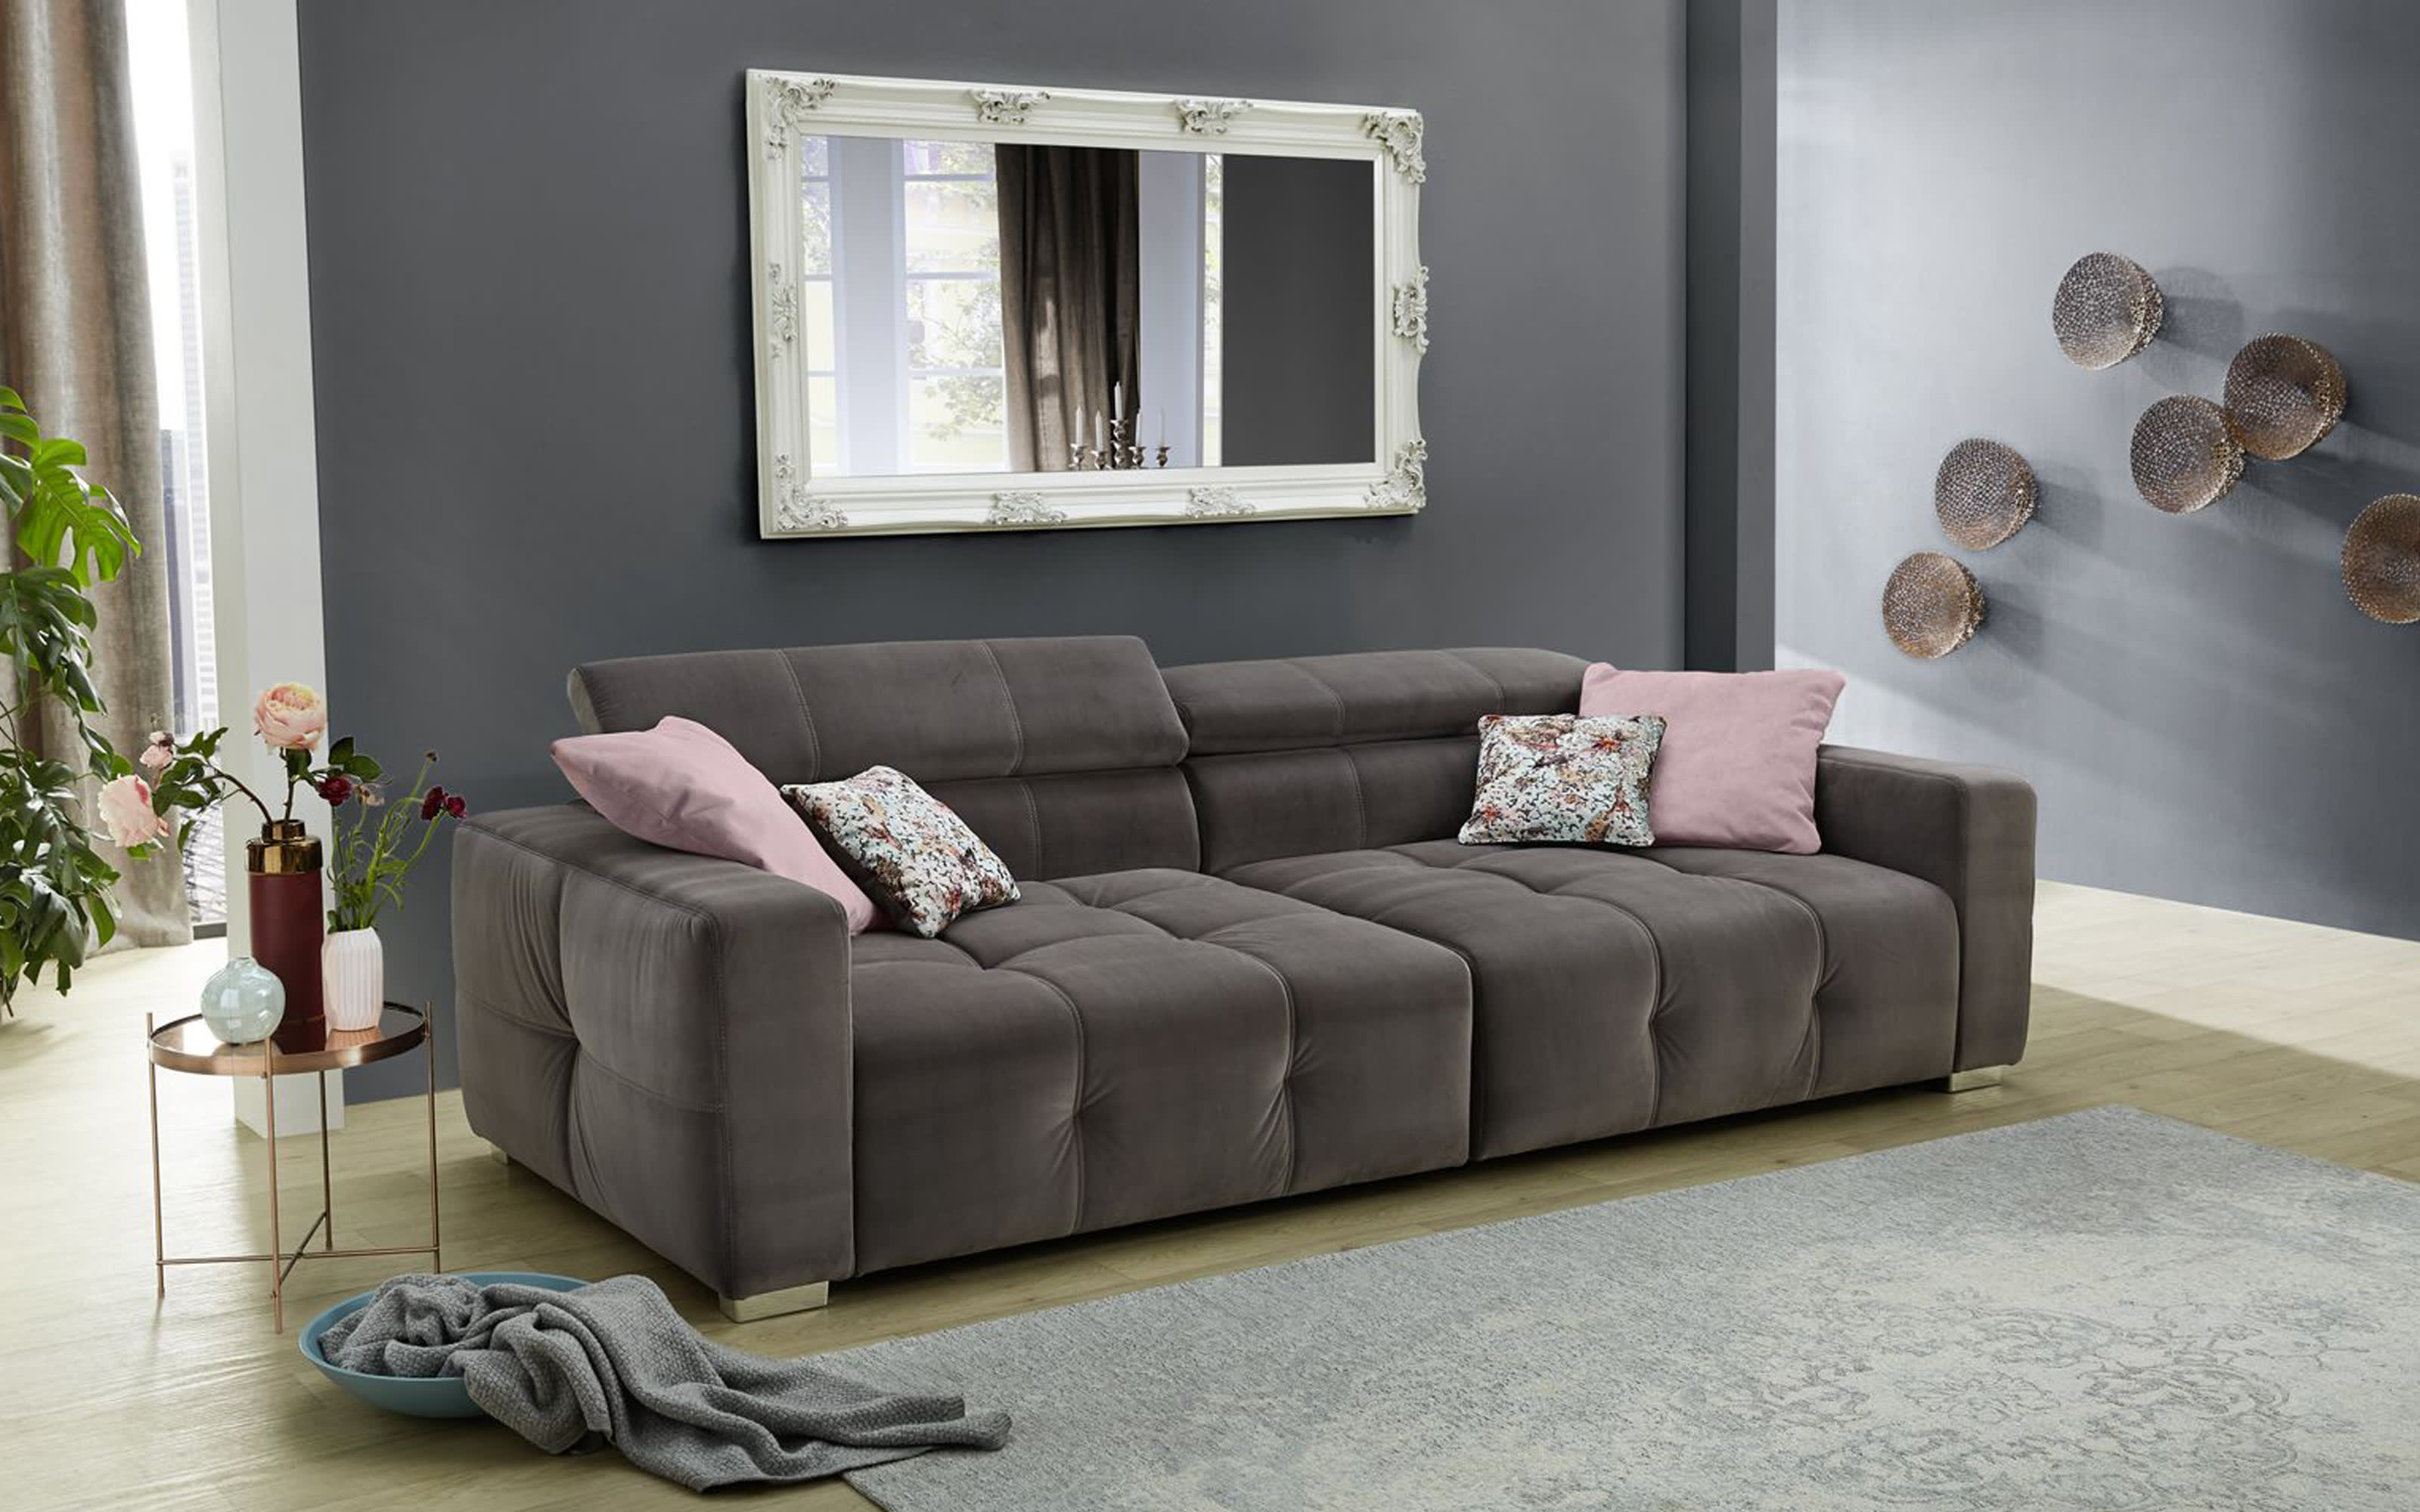 Big Sofa Trento in grau